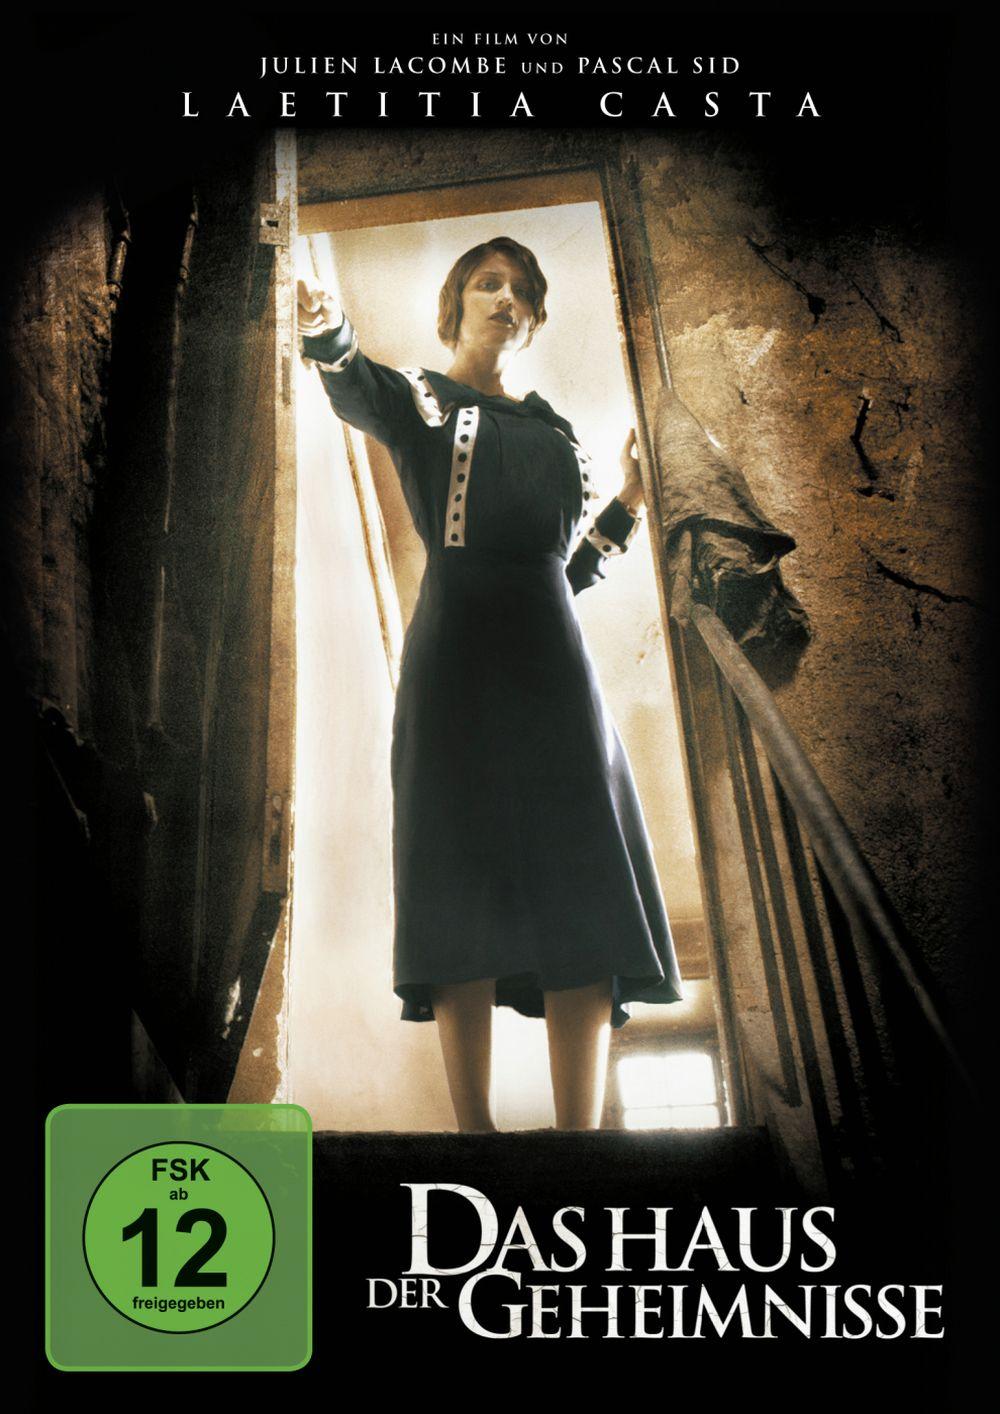 Horrorfilme Mit Fsk 12 Scary Moviesde